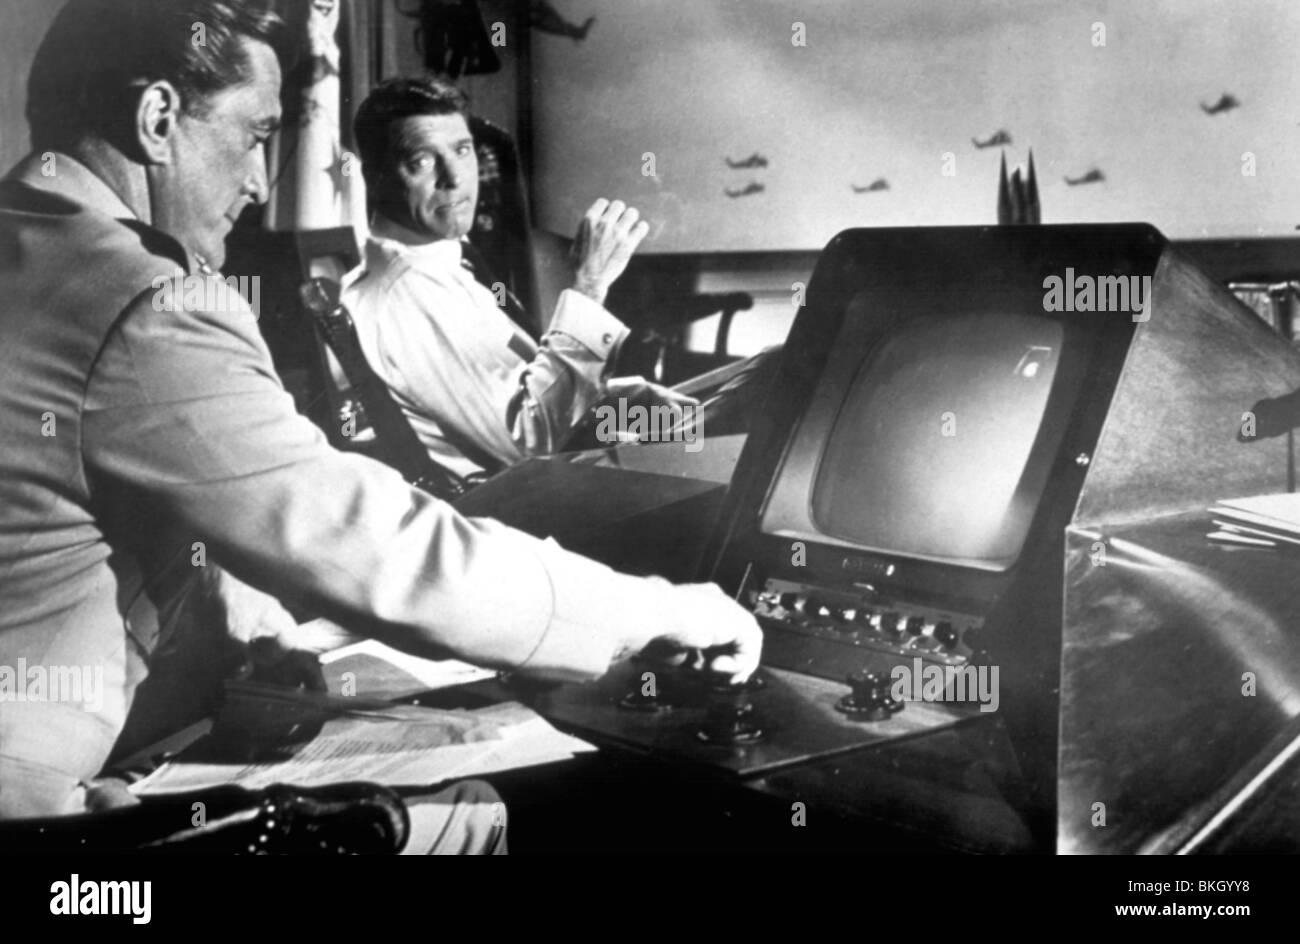 SEVEN DAYS IN MAY (1964) 7 DAYS IN MAY (ALT) KIRK DOUGLAS, BURT LANCASTER SDMY 005 - Stock Image